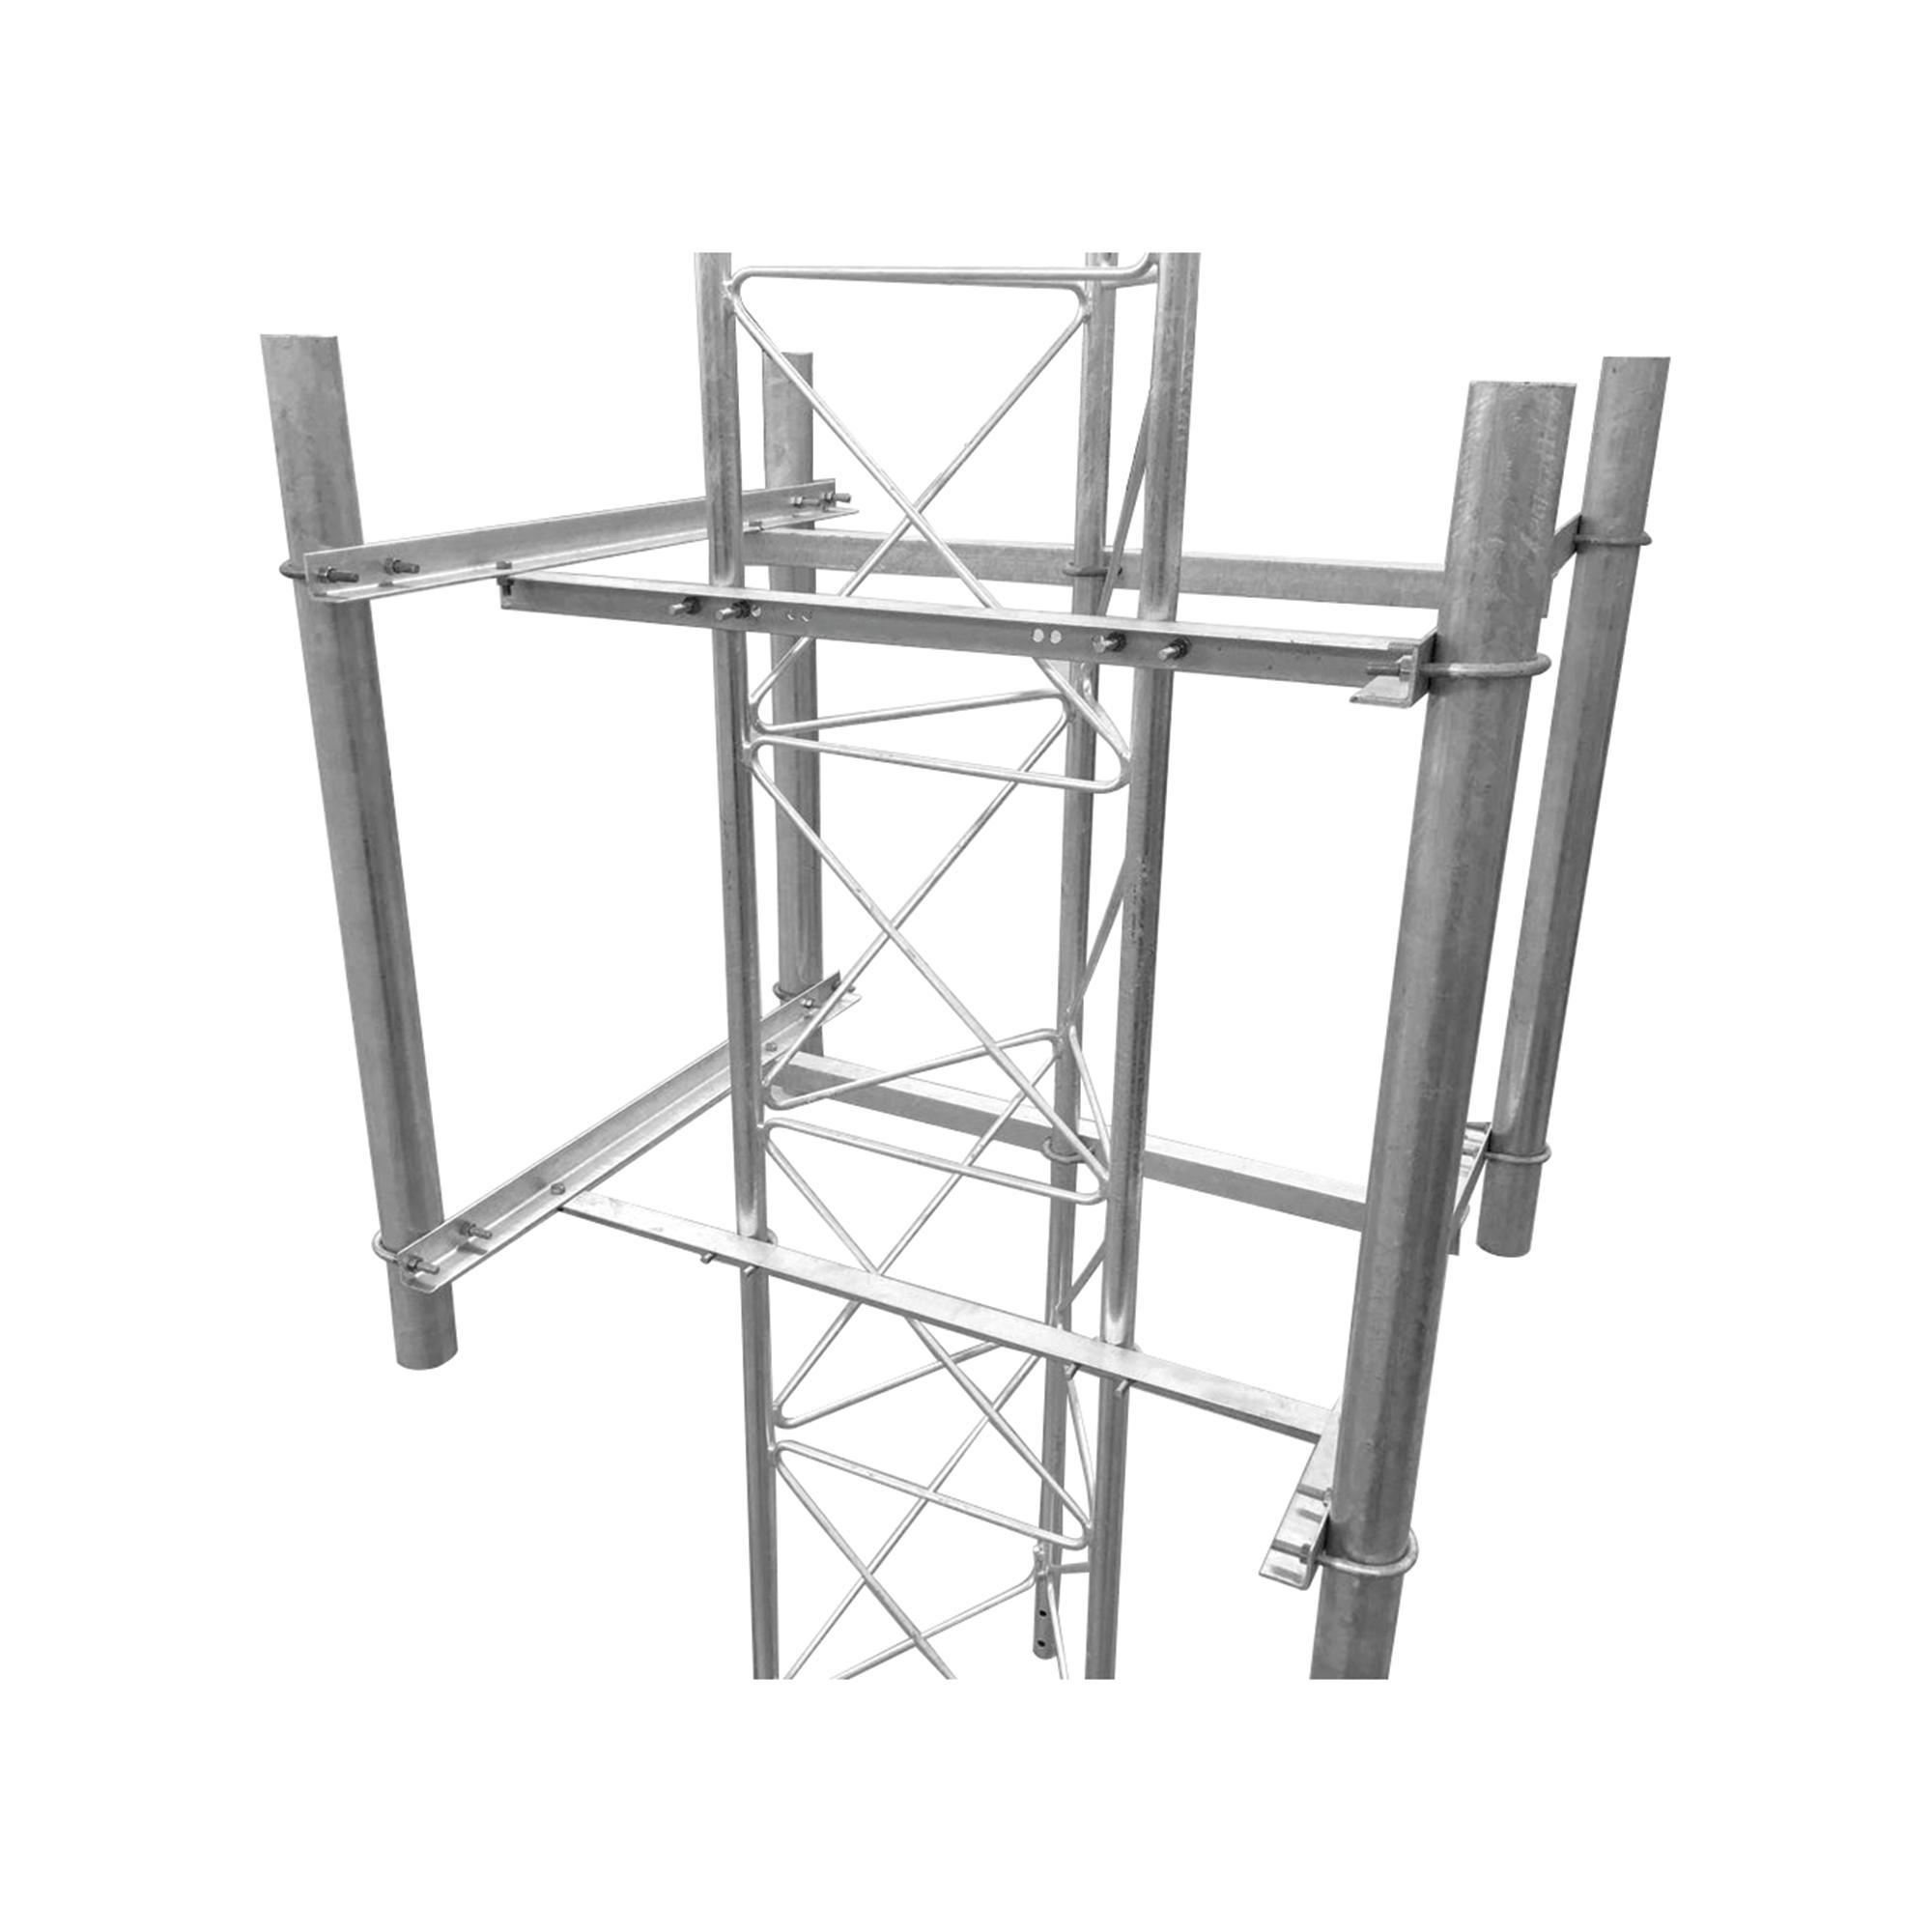 Brazo lateral de 4 sectores recomendado para antenas sectoriales con angulo de apertura de 90? (o similar).